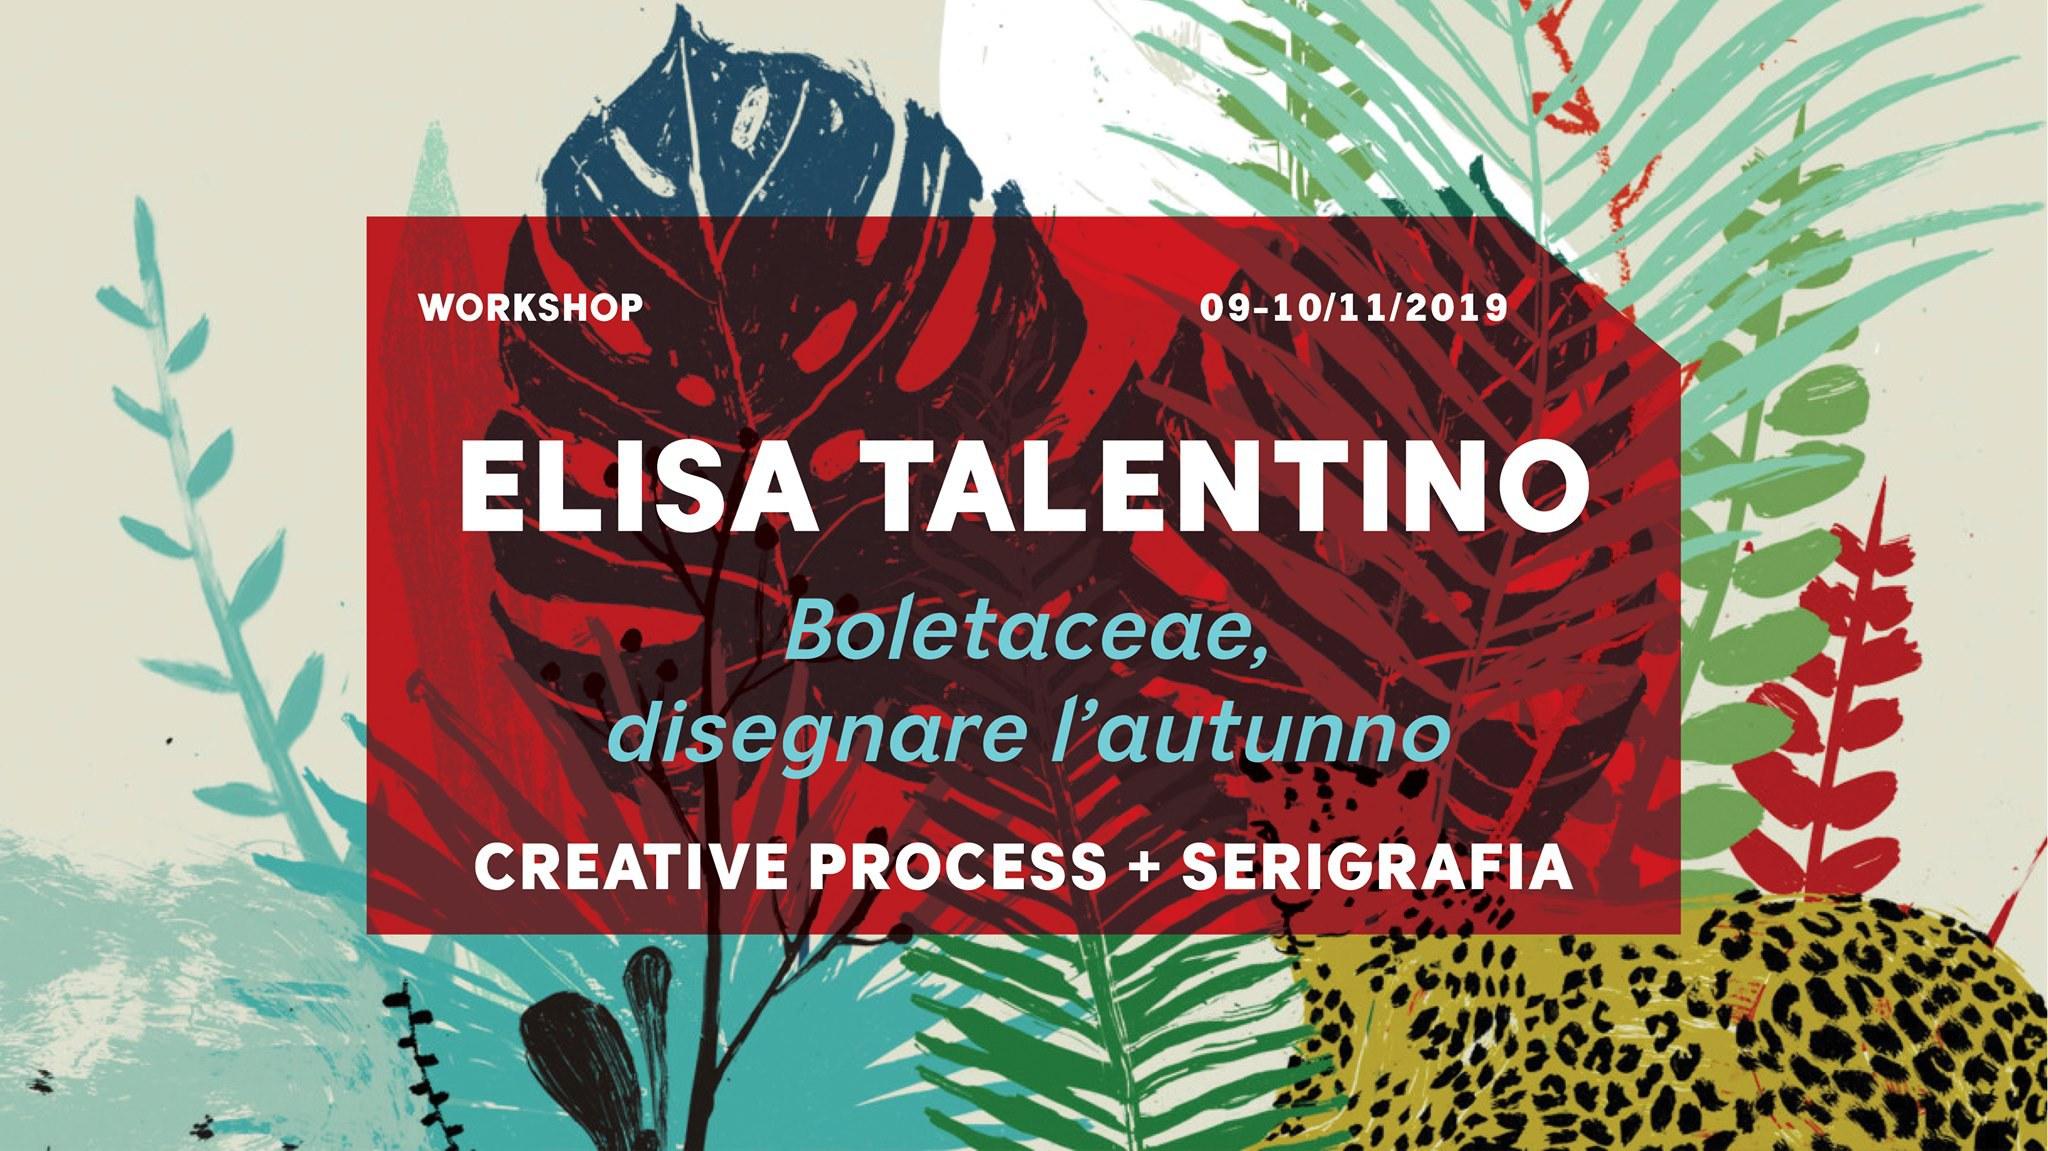 Workshop   Elisa Talentino Boletaceae, disegnare l'autunno